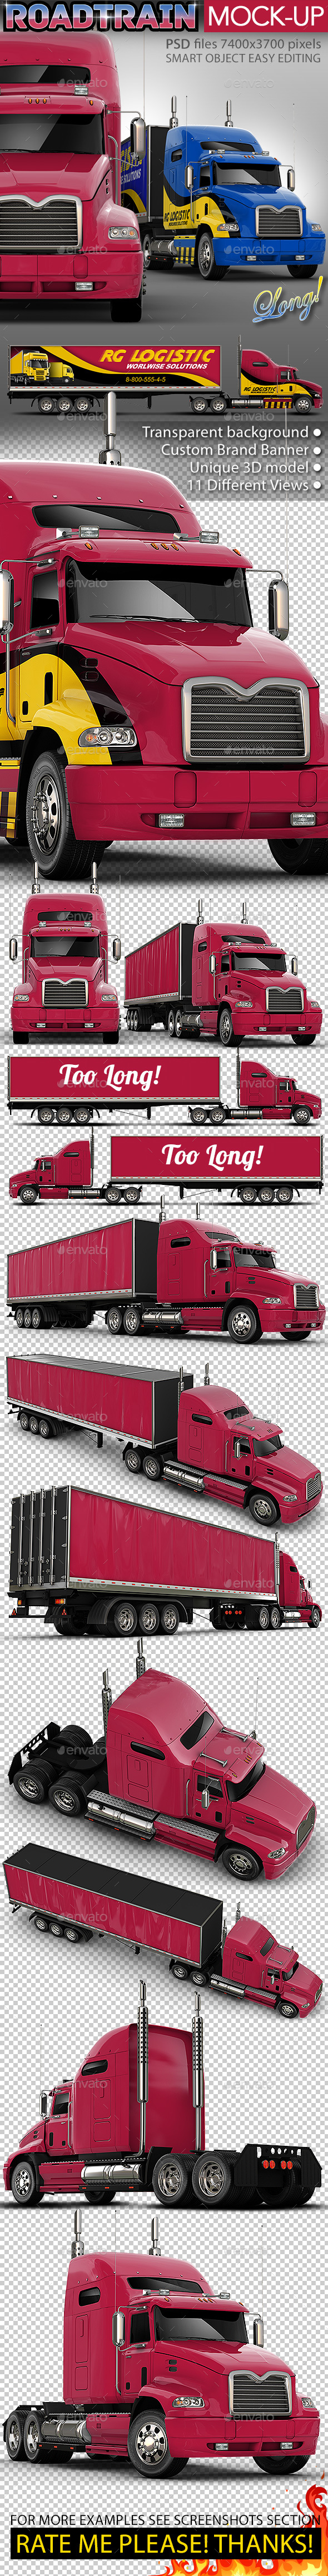 Road Truck based Mack pinnacle Mock-up - Vehicle Wraps Print